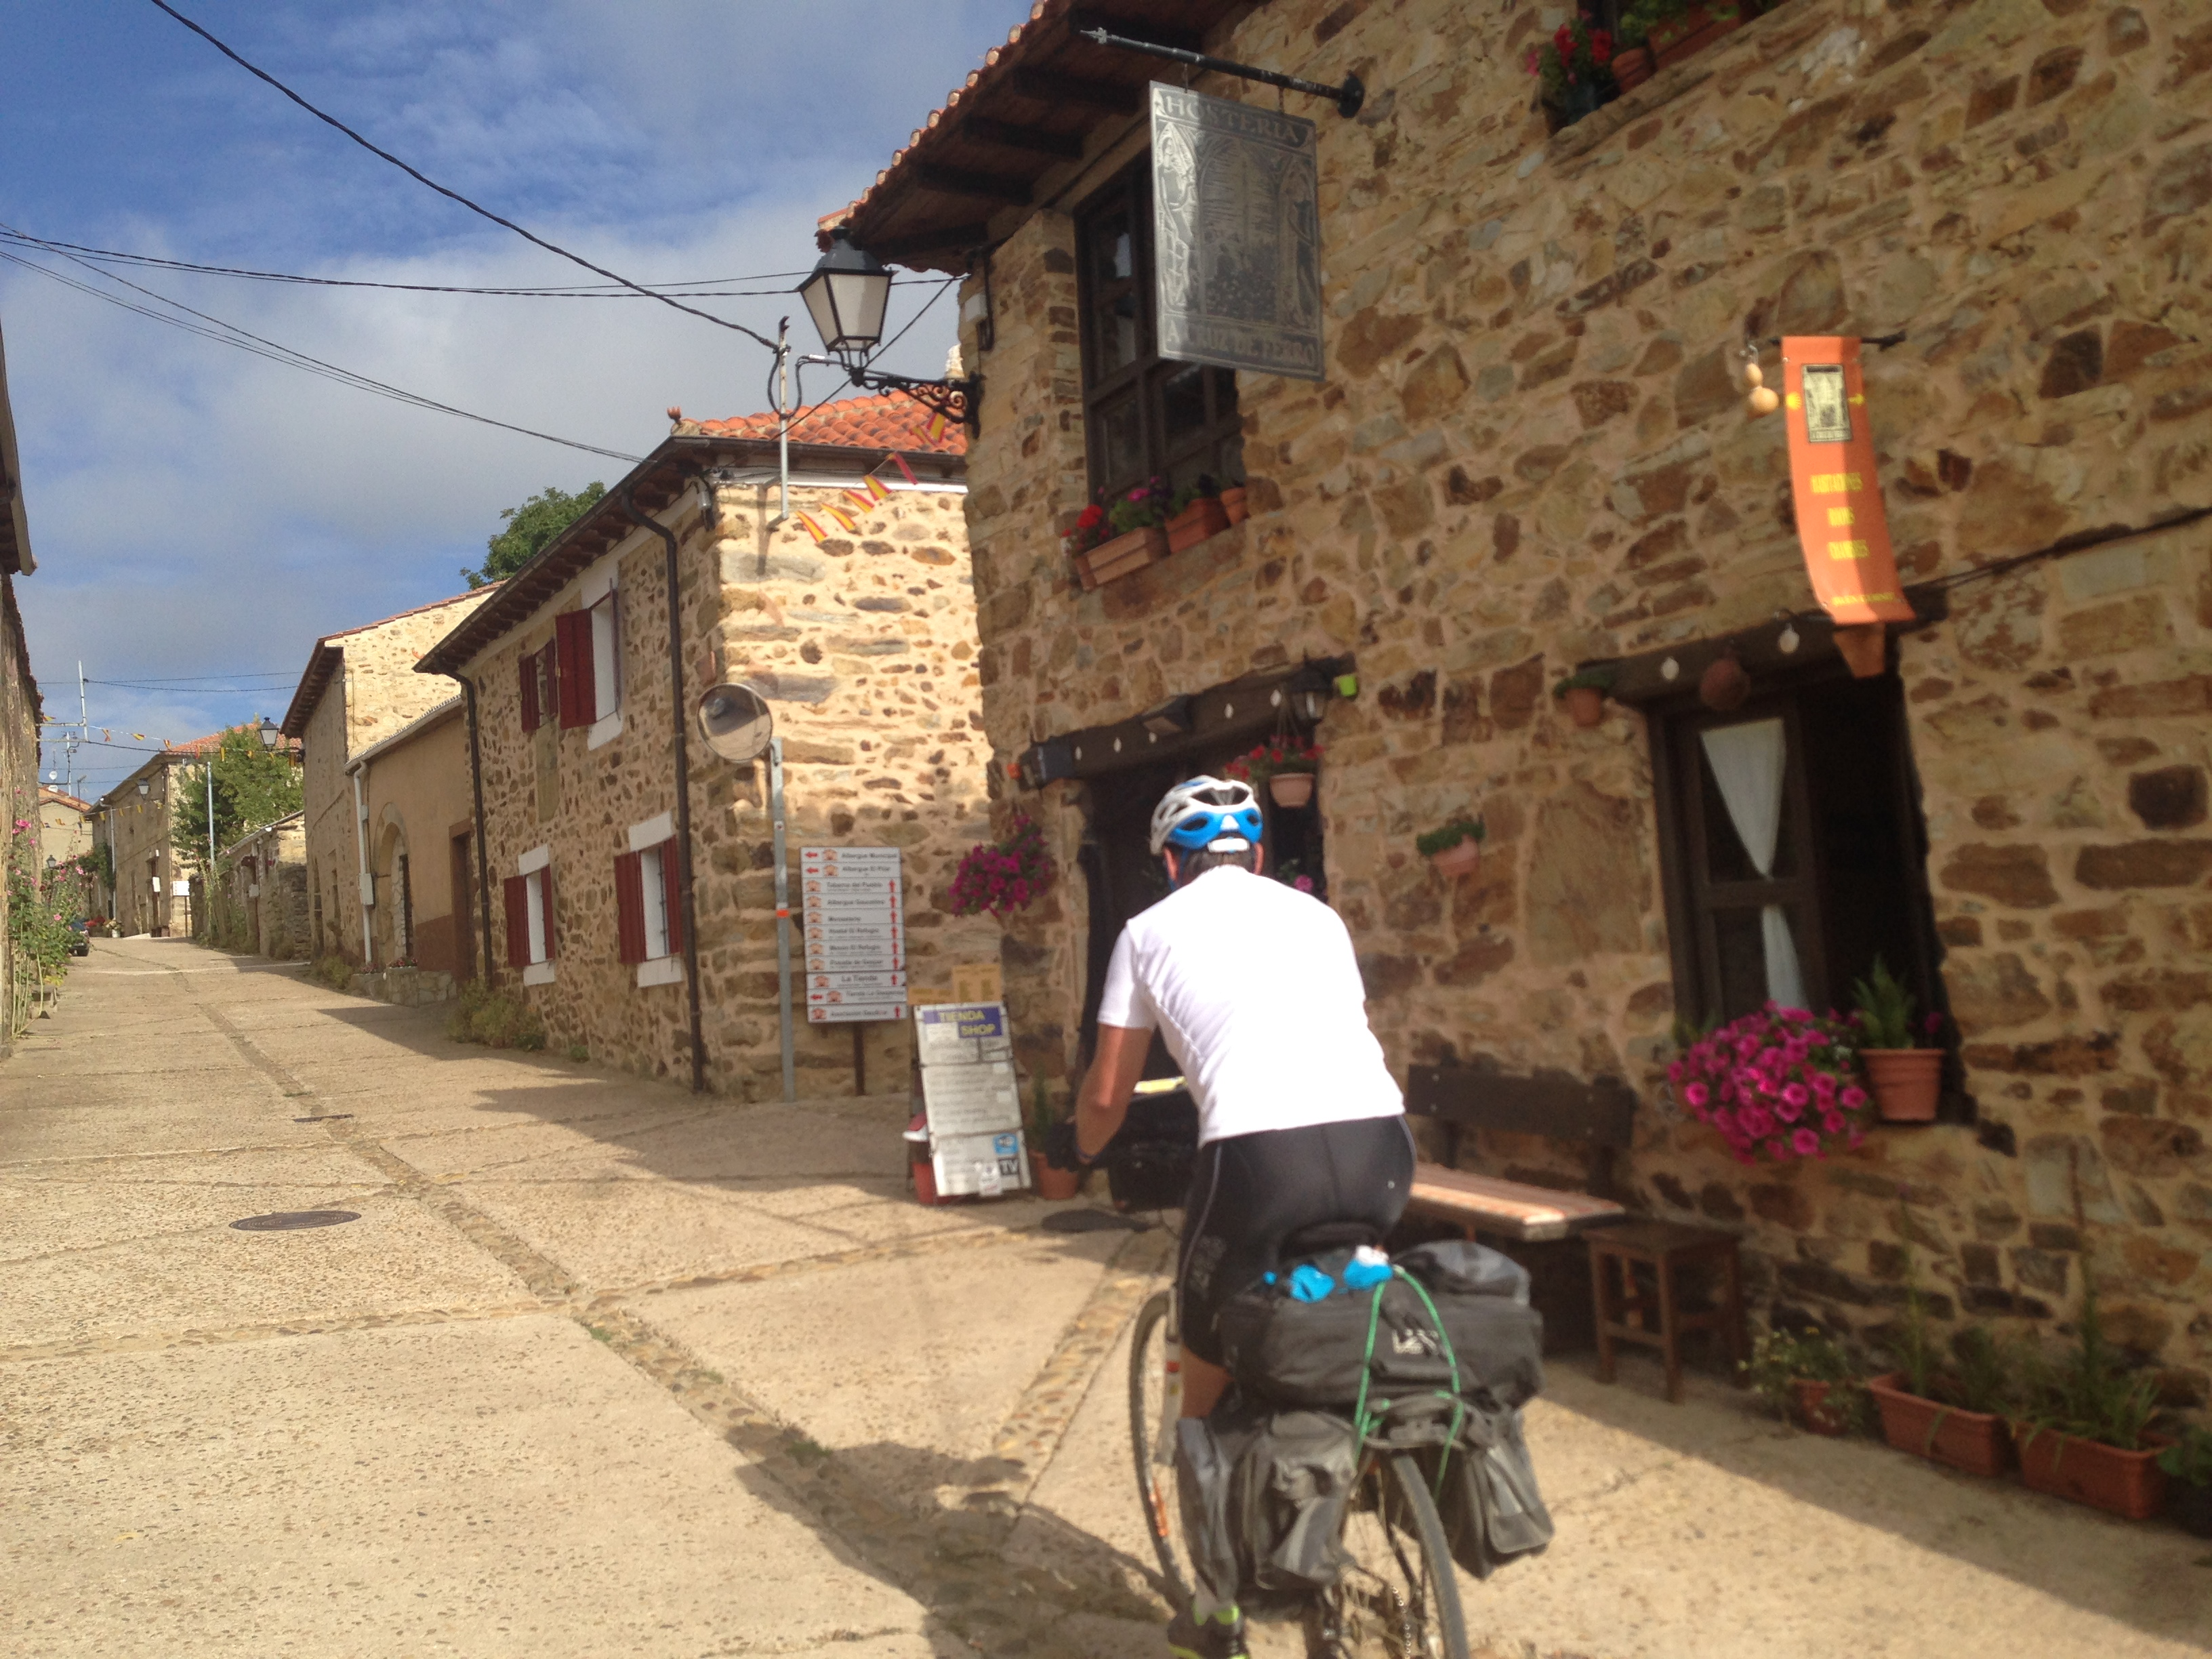 camino de santiago iphone 2014 910 IMG_5348.jpg